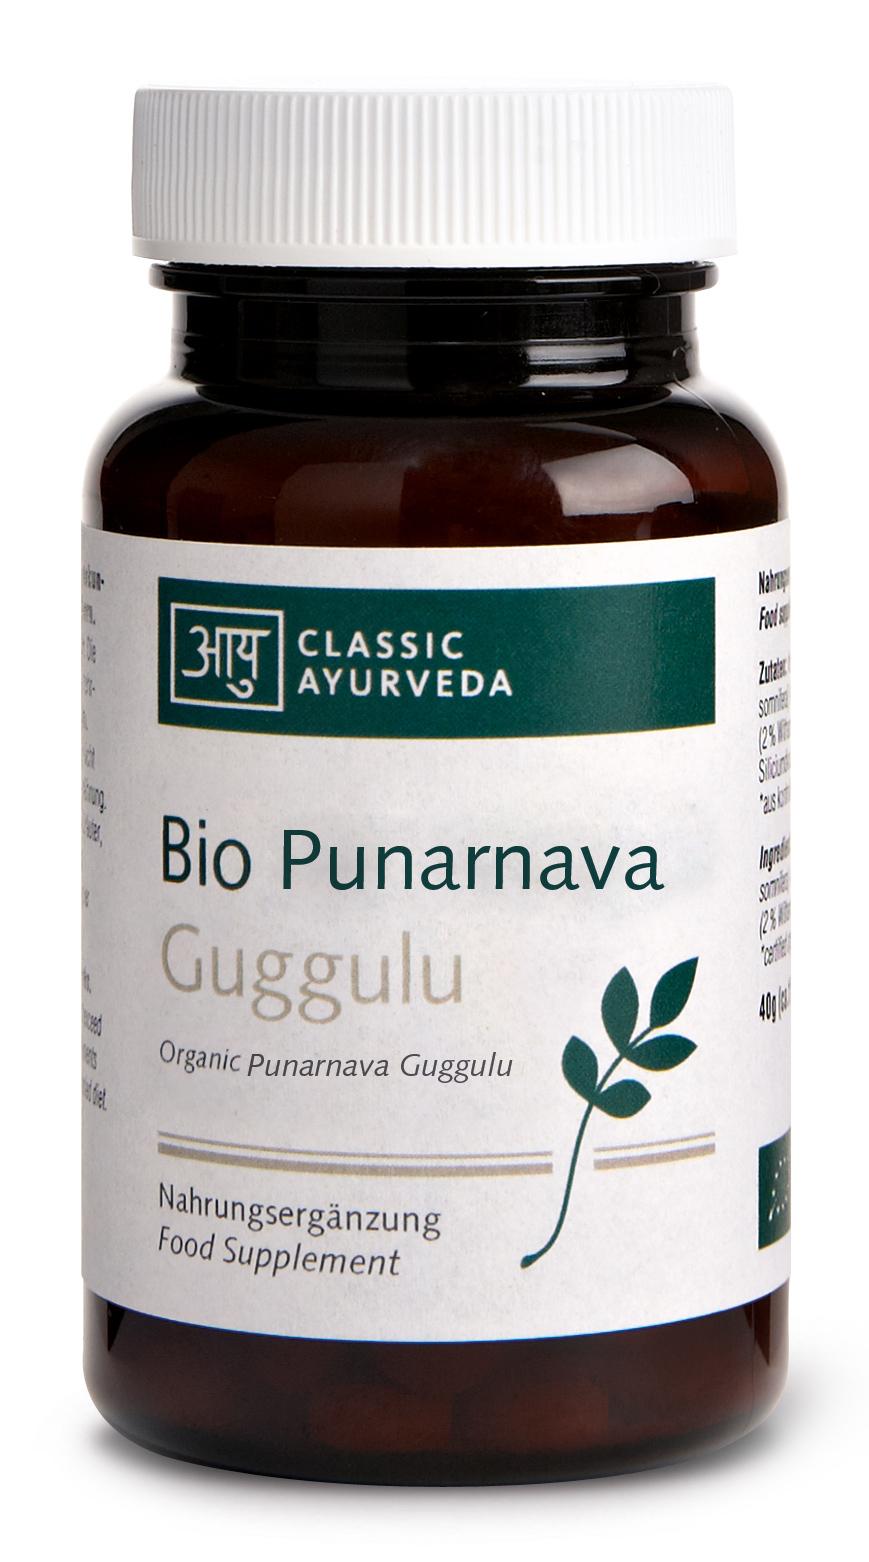 Bio Punarnavadi Guggulu (ca. 90 Kapseln), 45 g